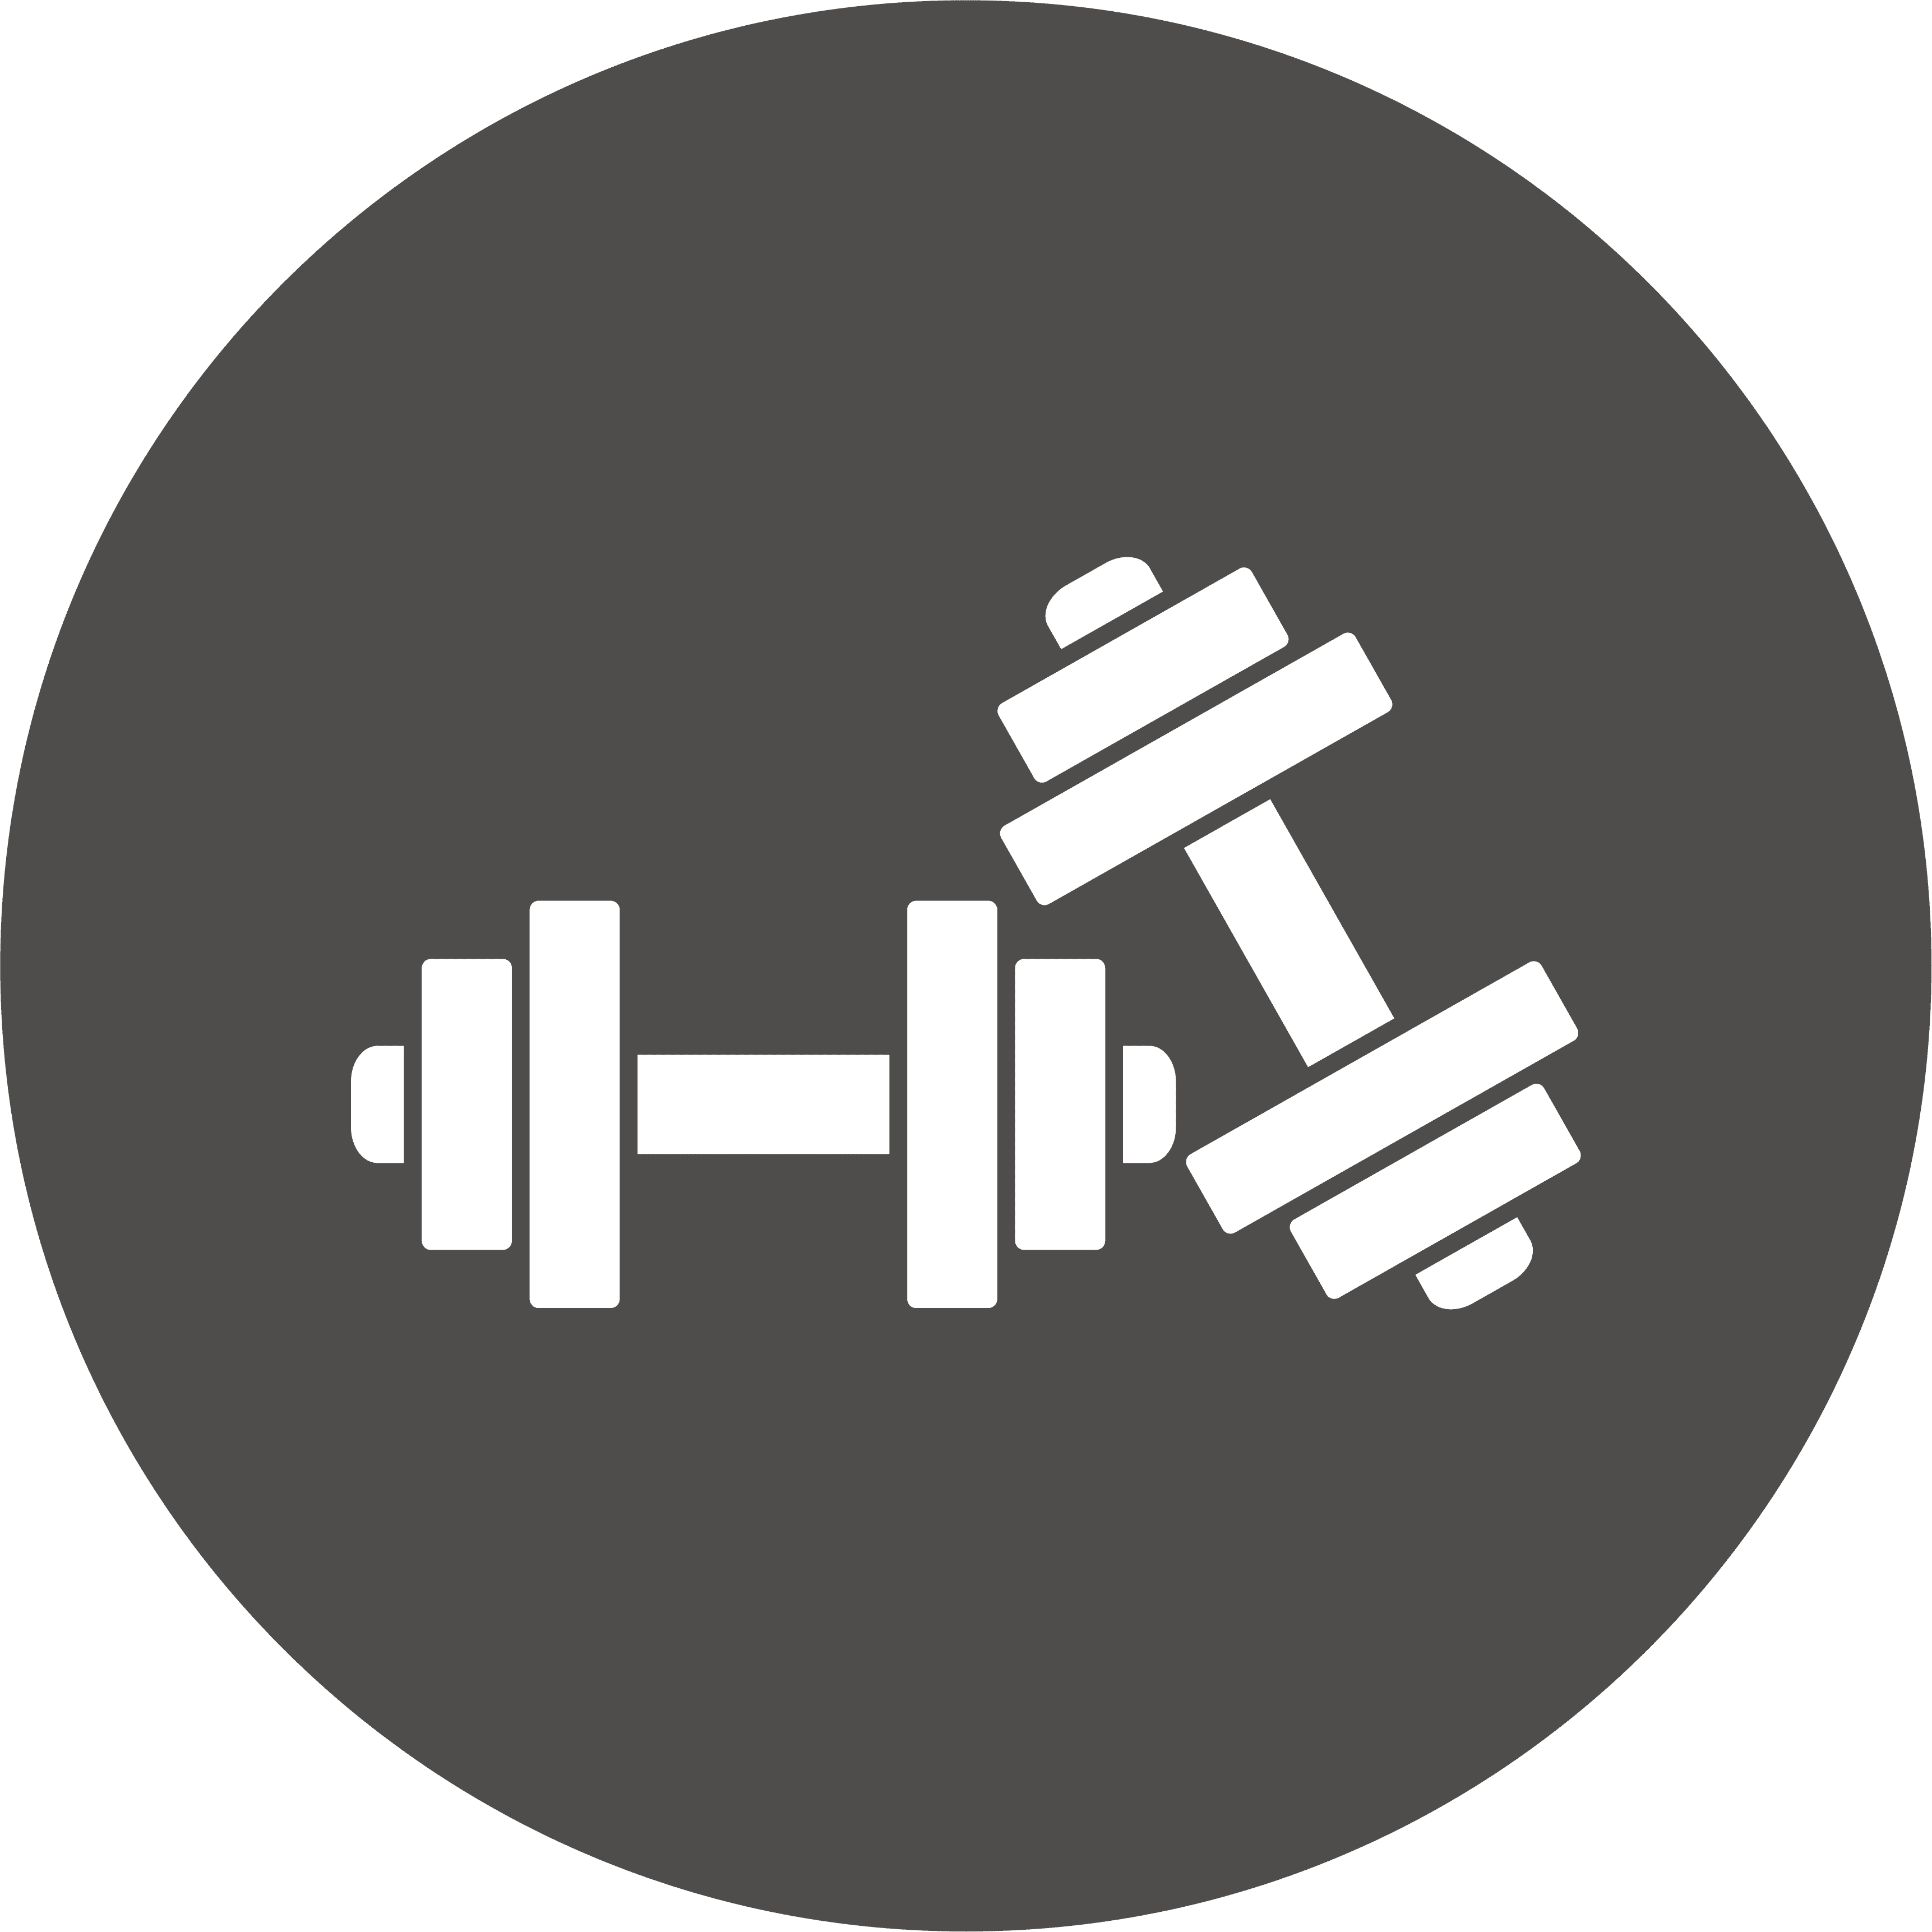 icona pesi per braccia